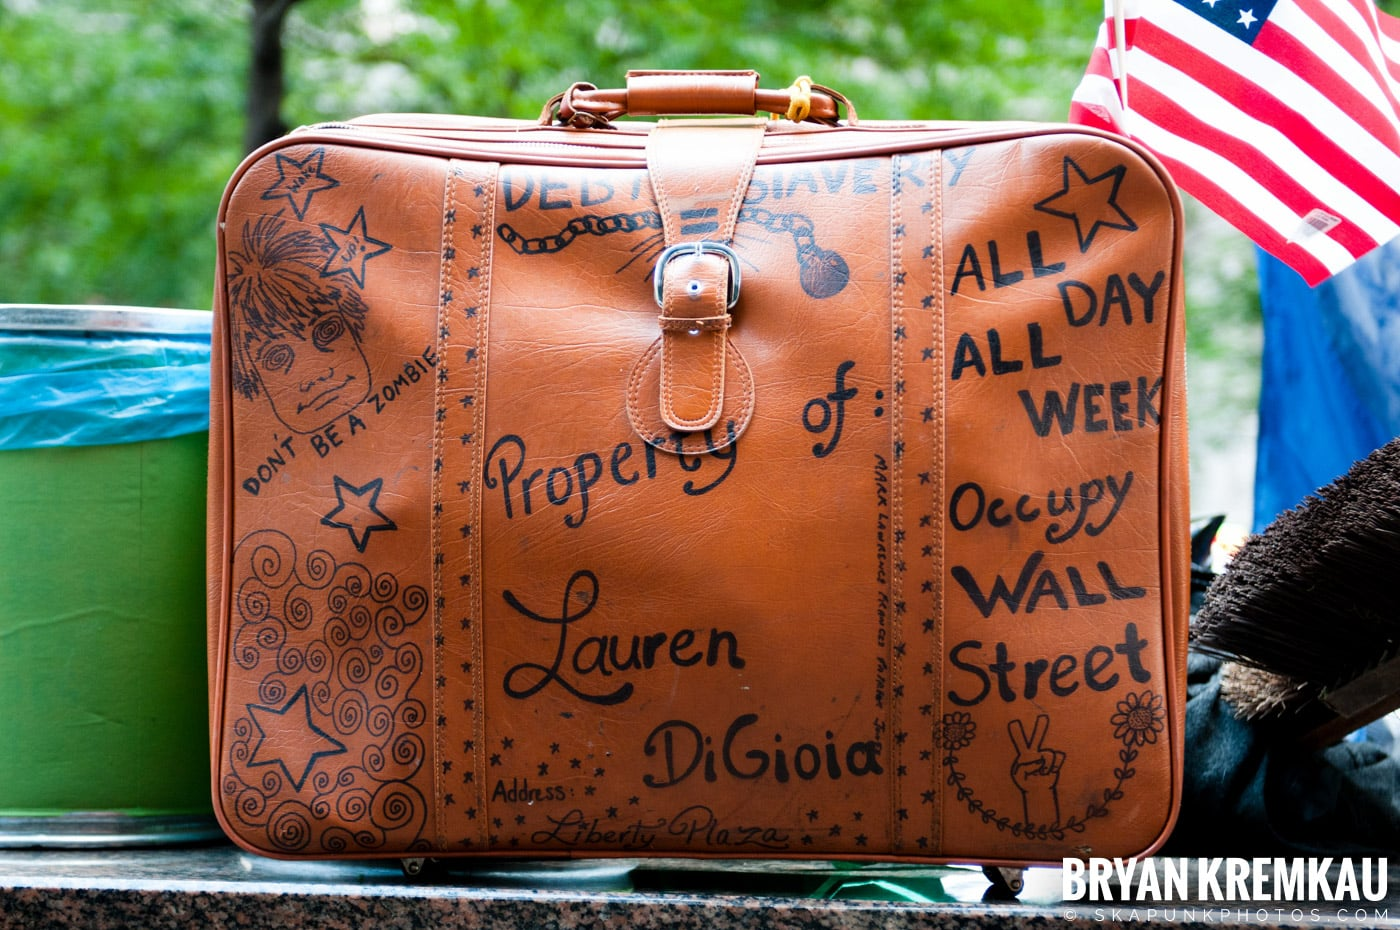 Occupy Wall Street @ Zuccotti Park and Washington Square Park, NYC - 10.15.11 (100)